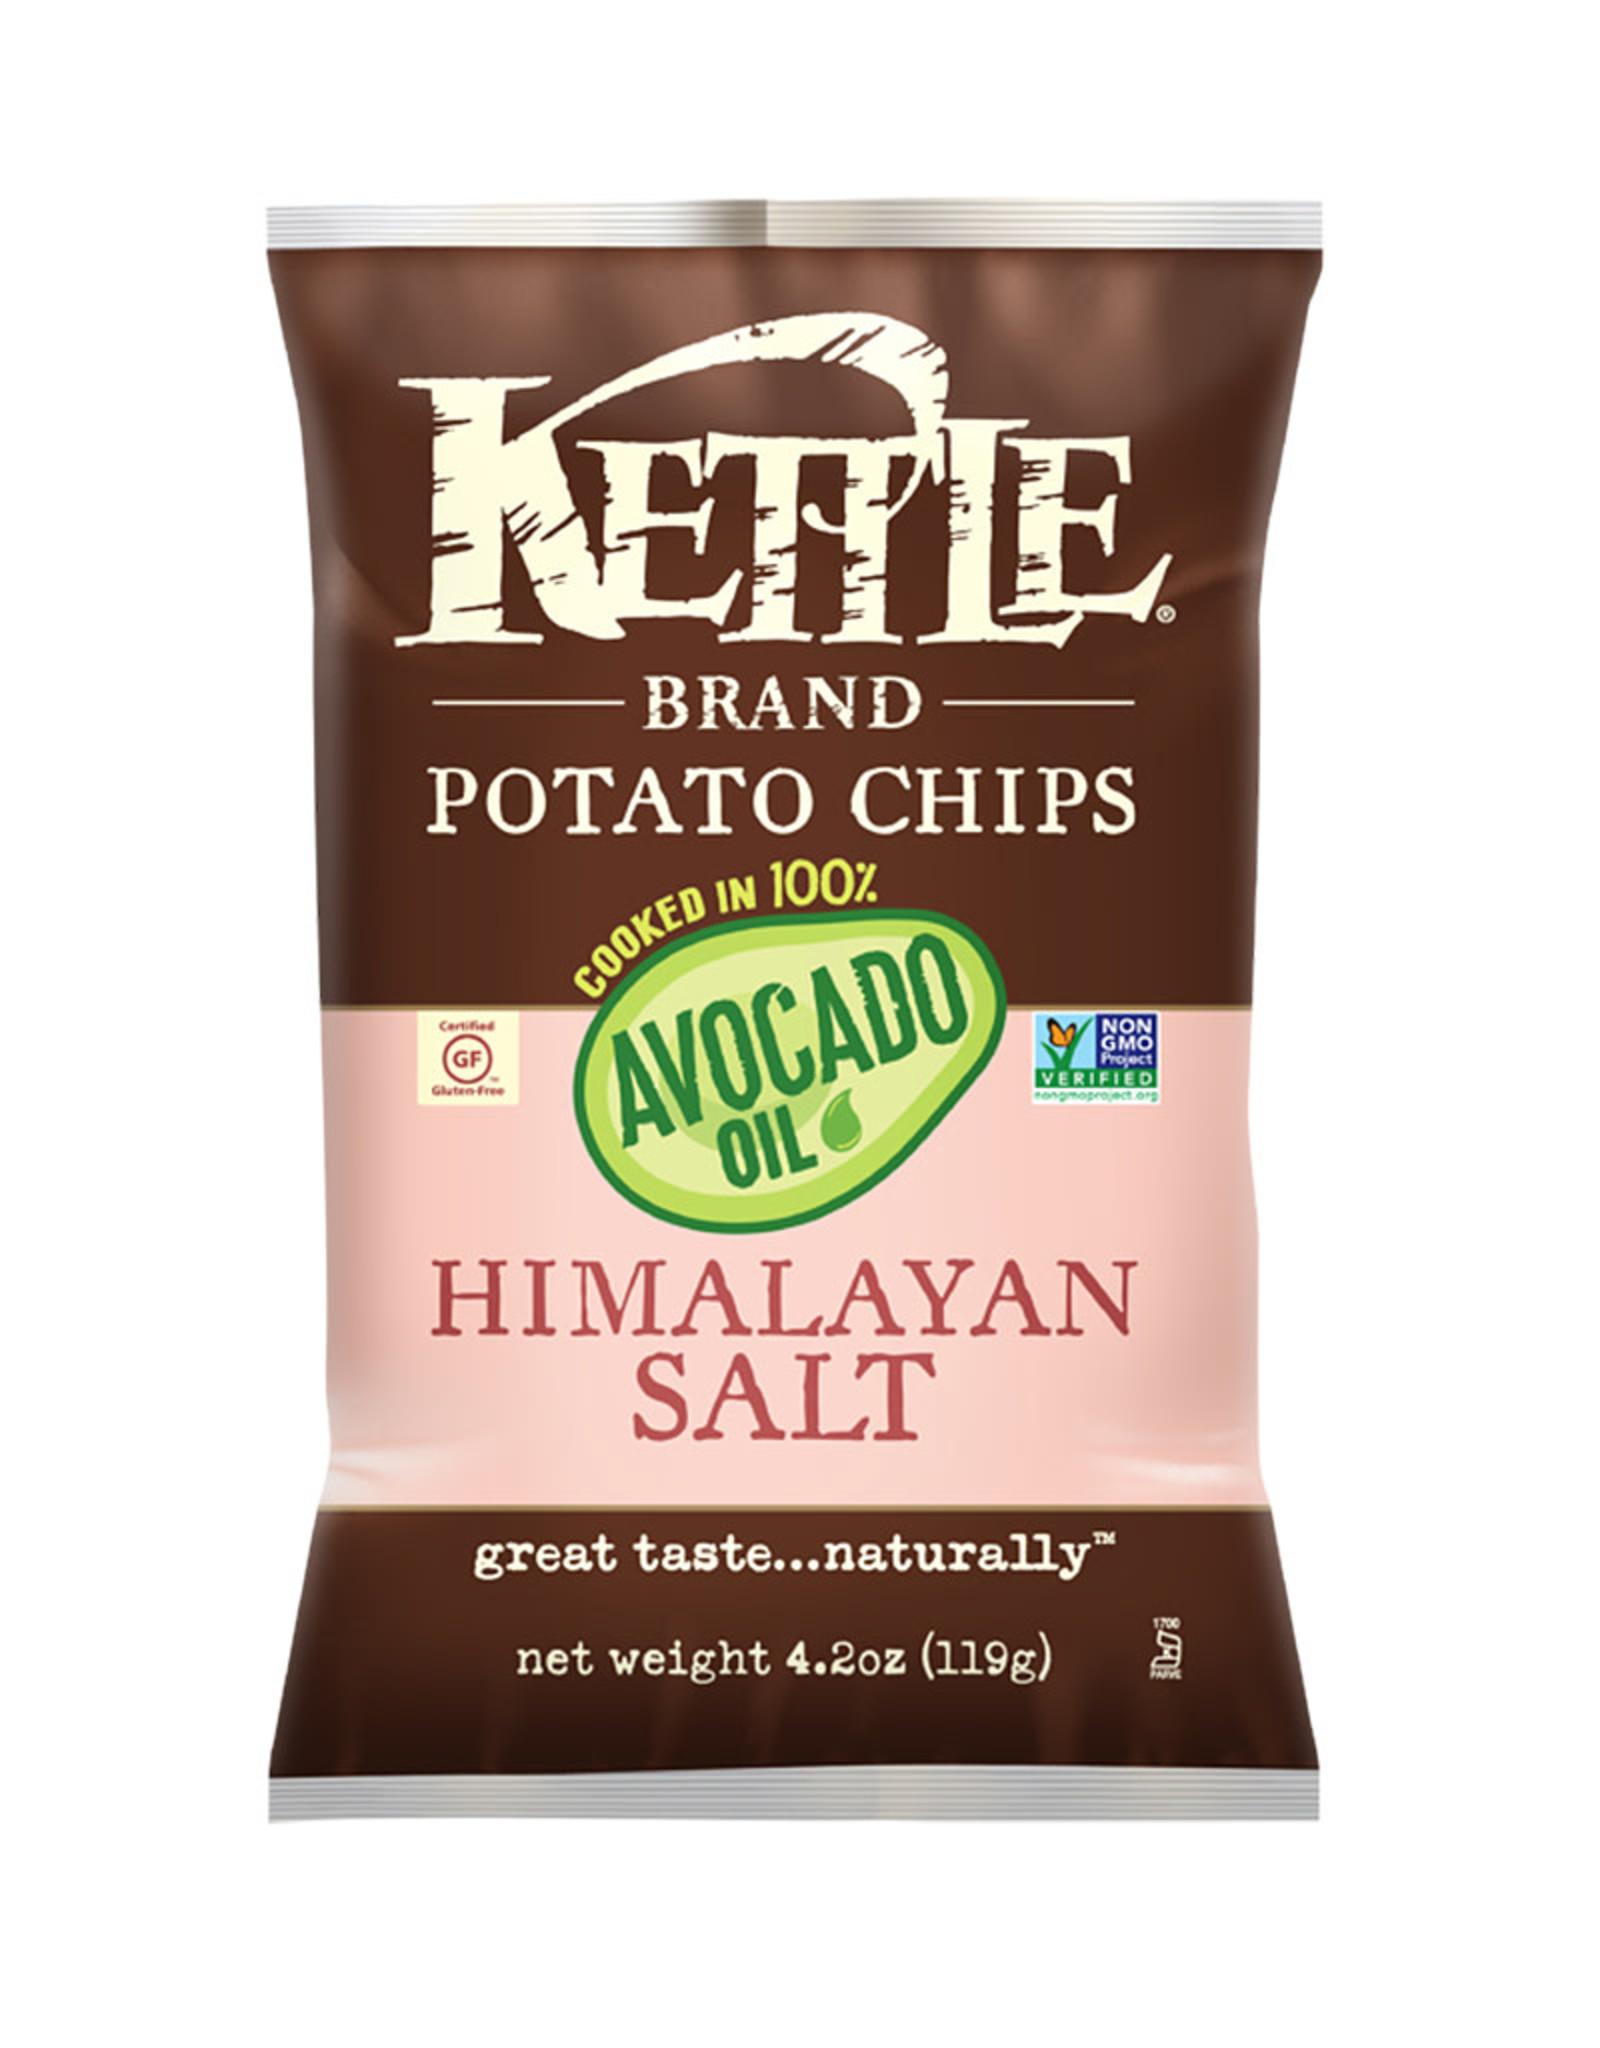 Kettle Brand Kettle Brand - Potato Chips, Avocado Oil Himalayan Salt (170g)